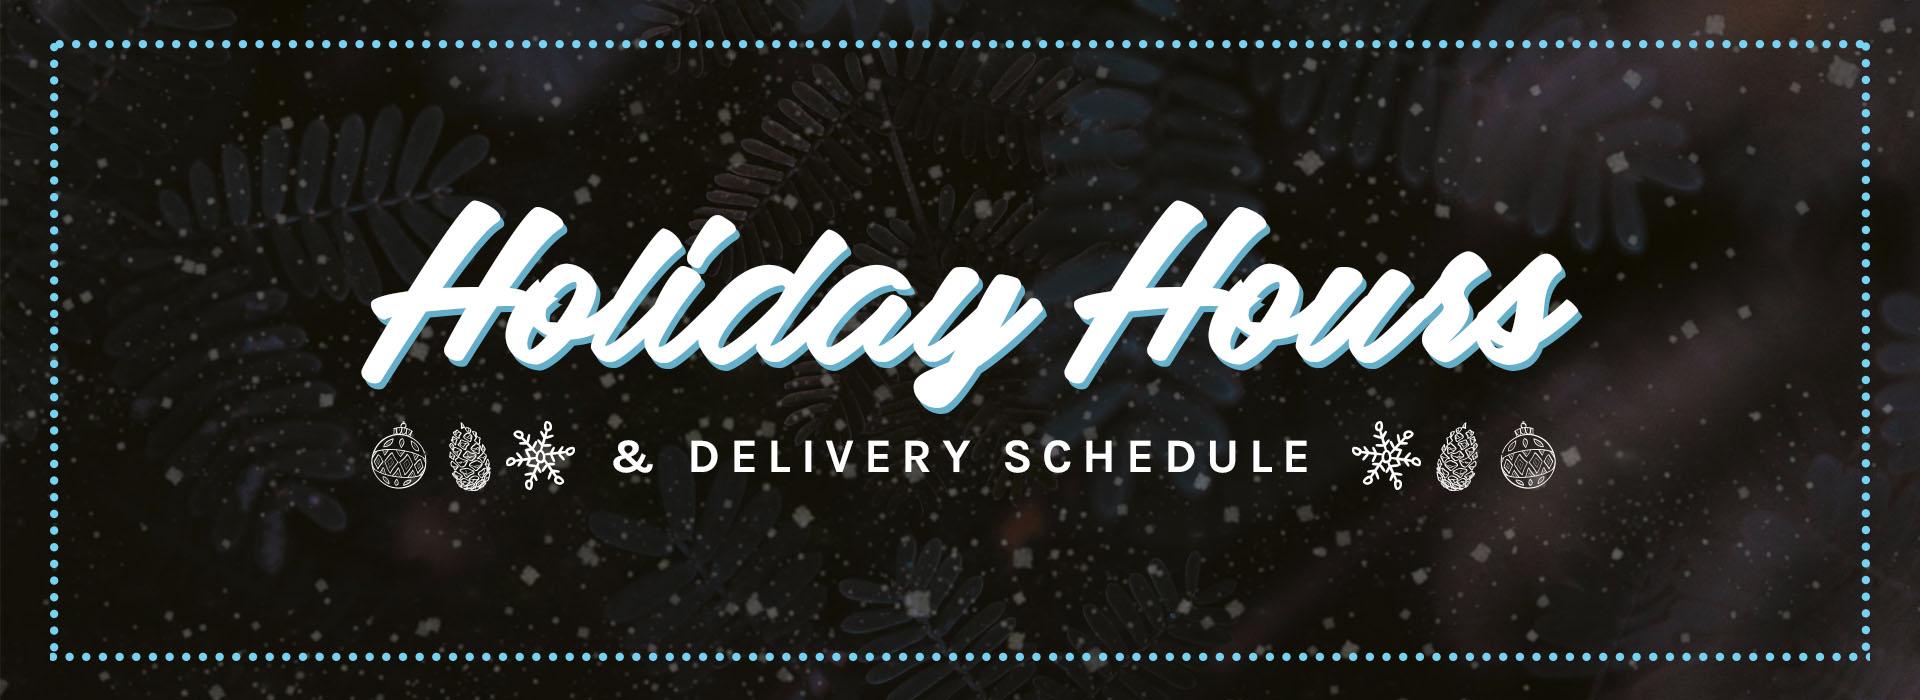 holidayhours-1920x700.jpg